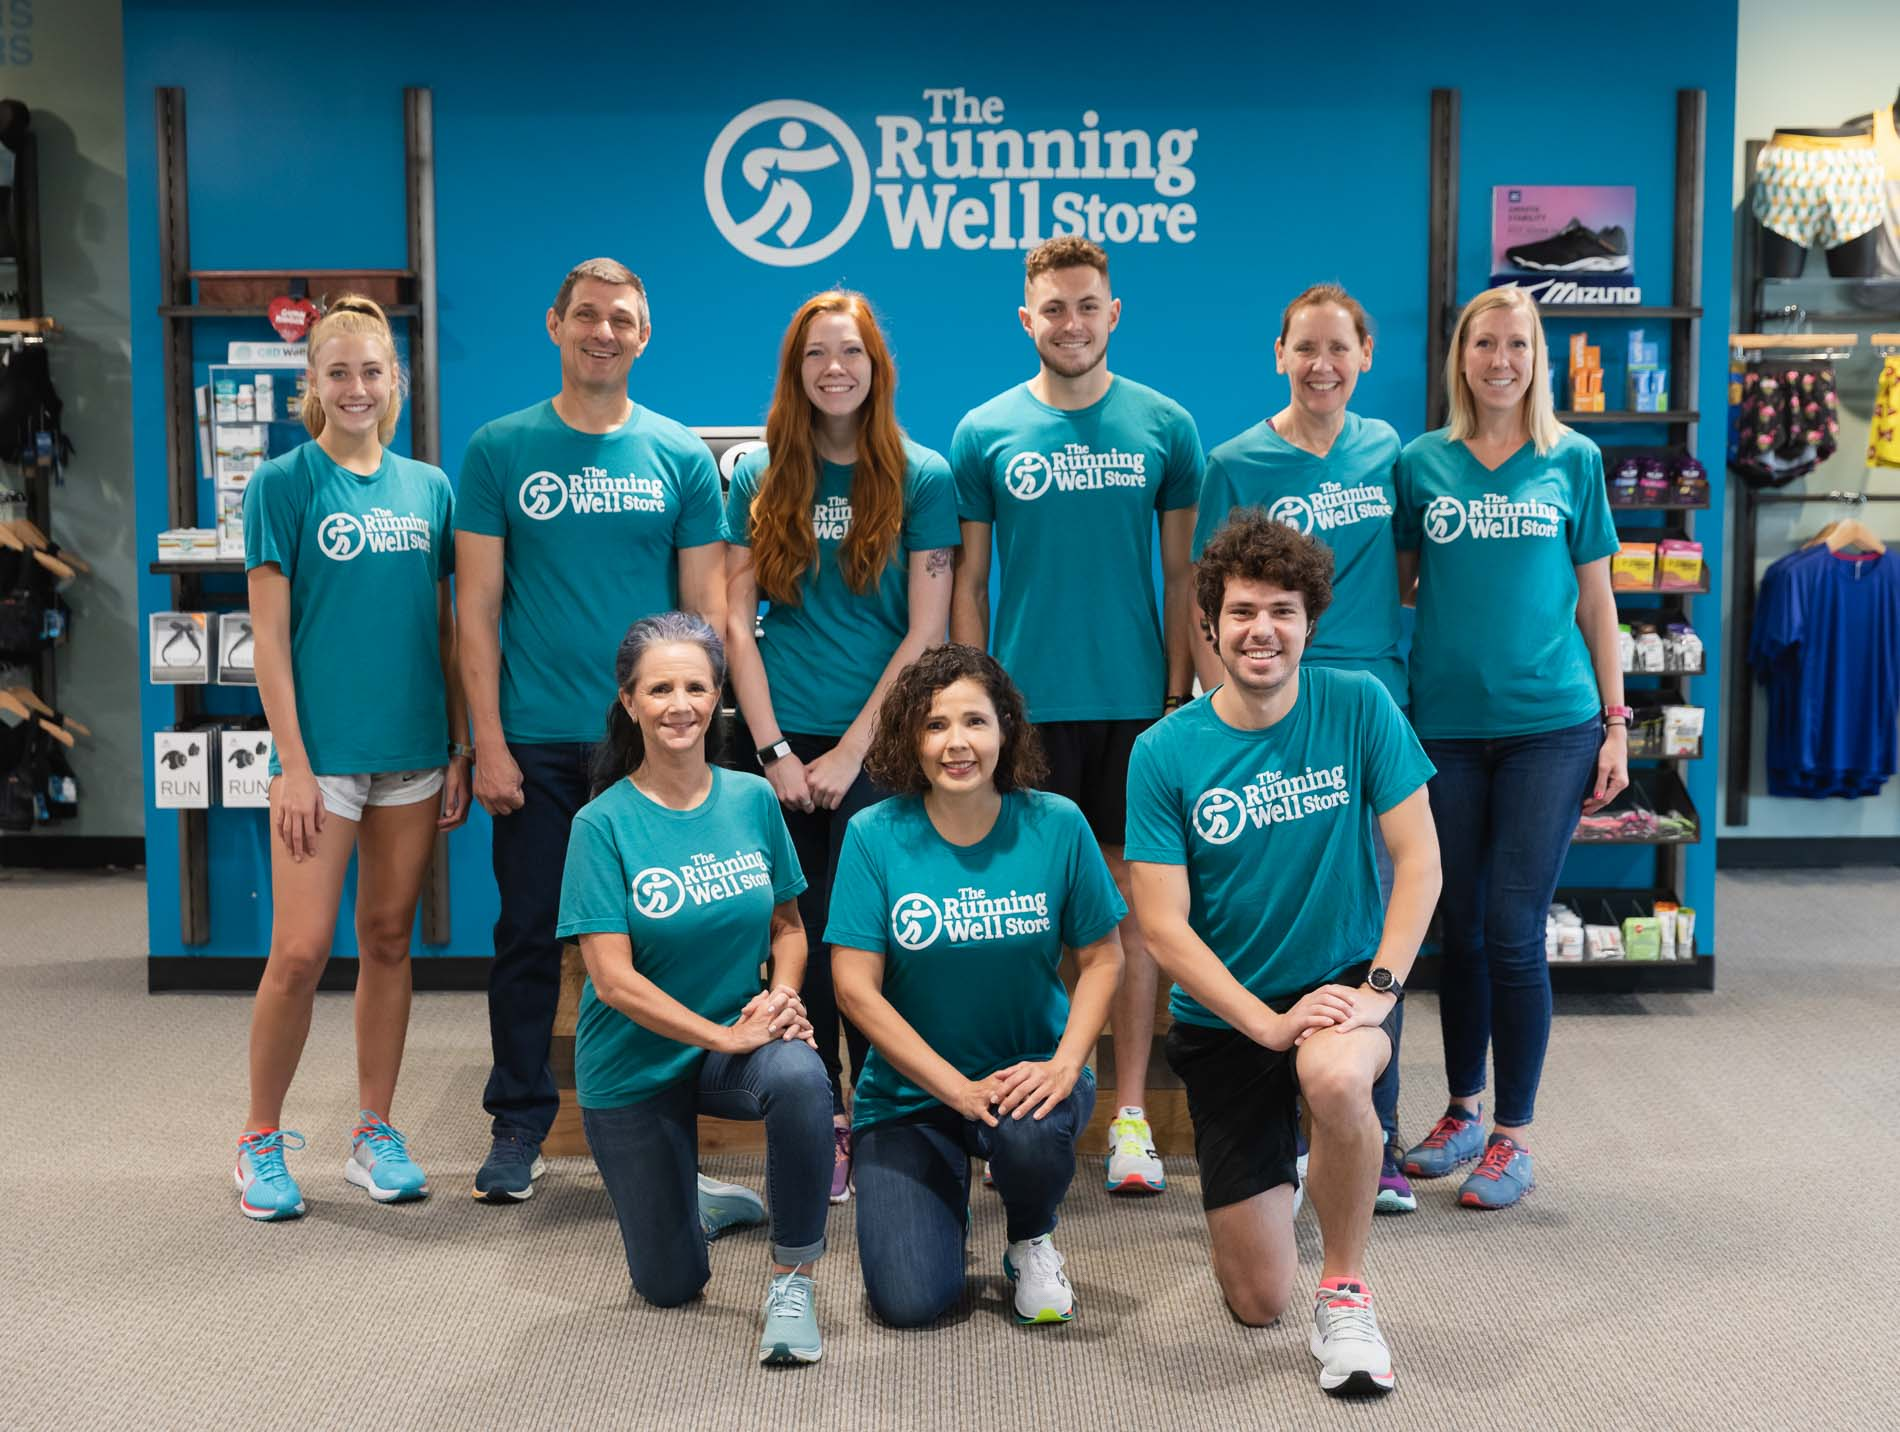 group photo of the running well store team of gurus (associates)